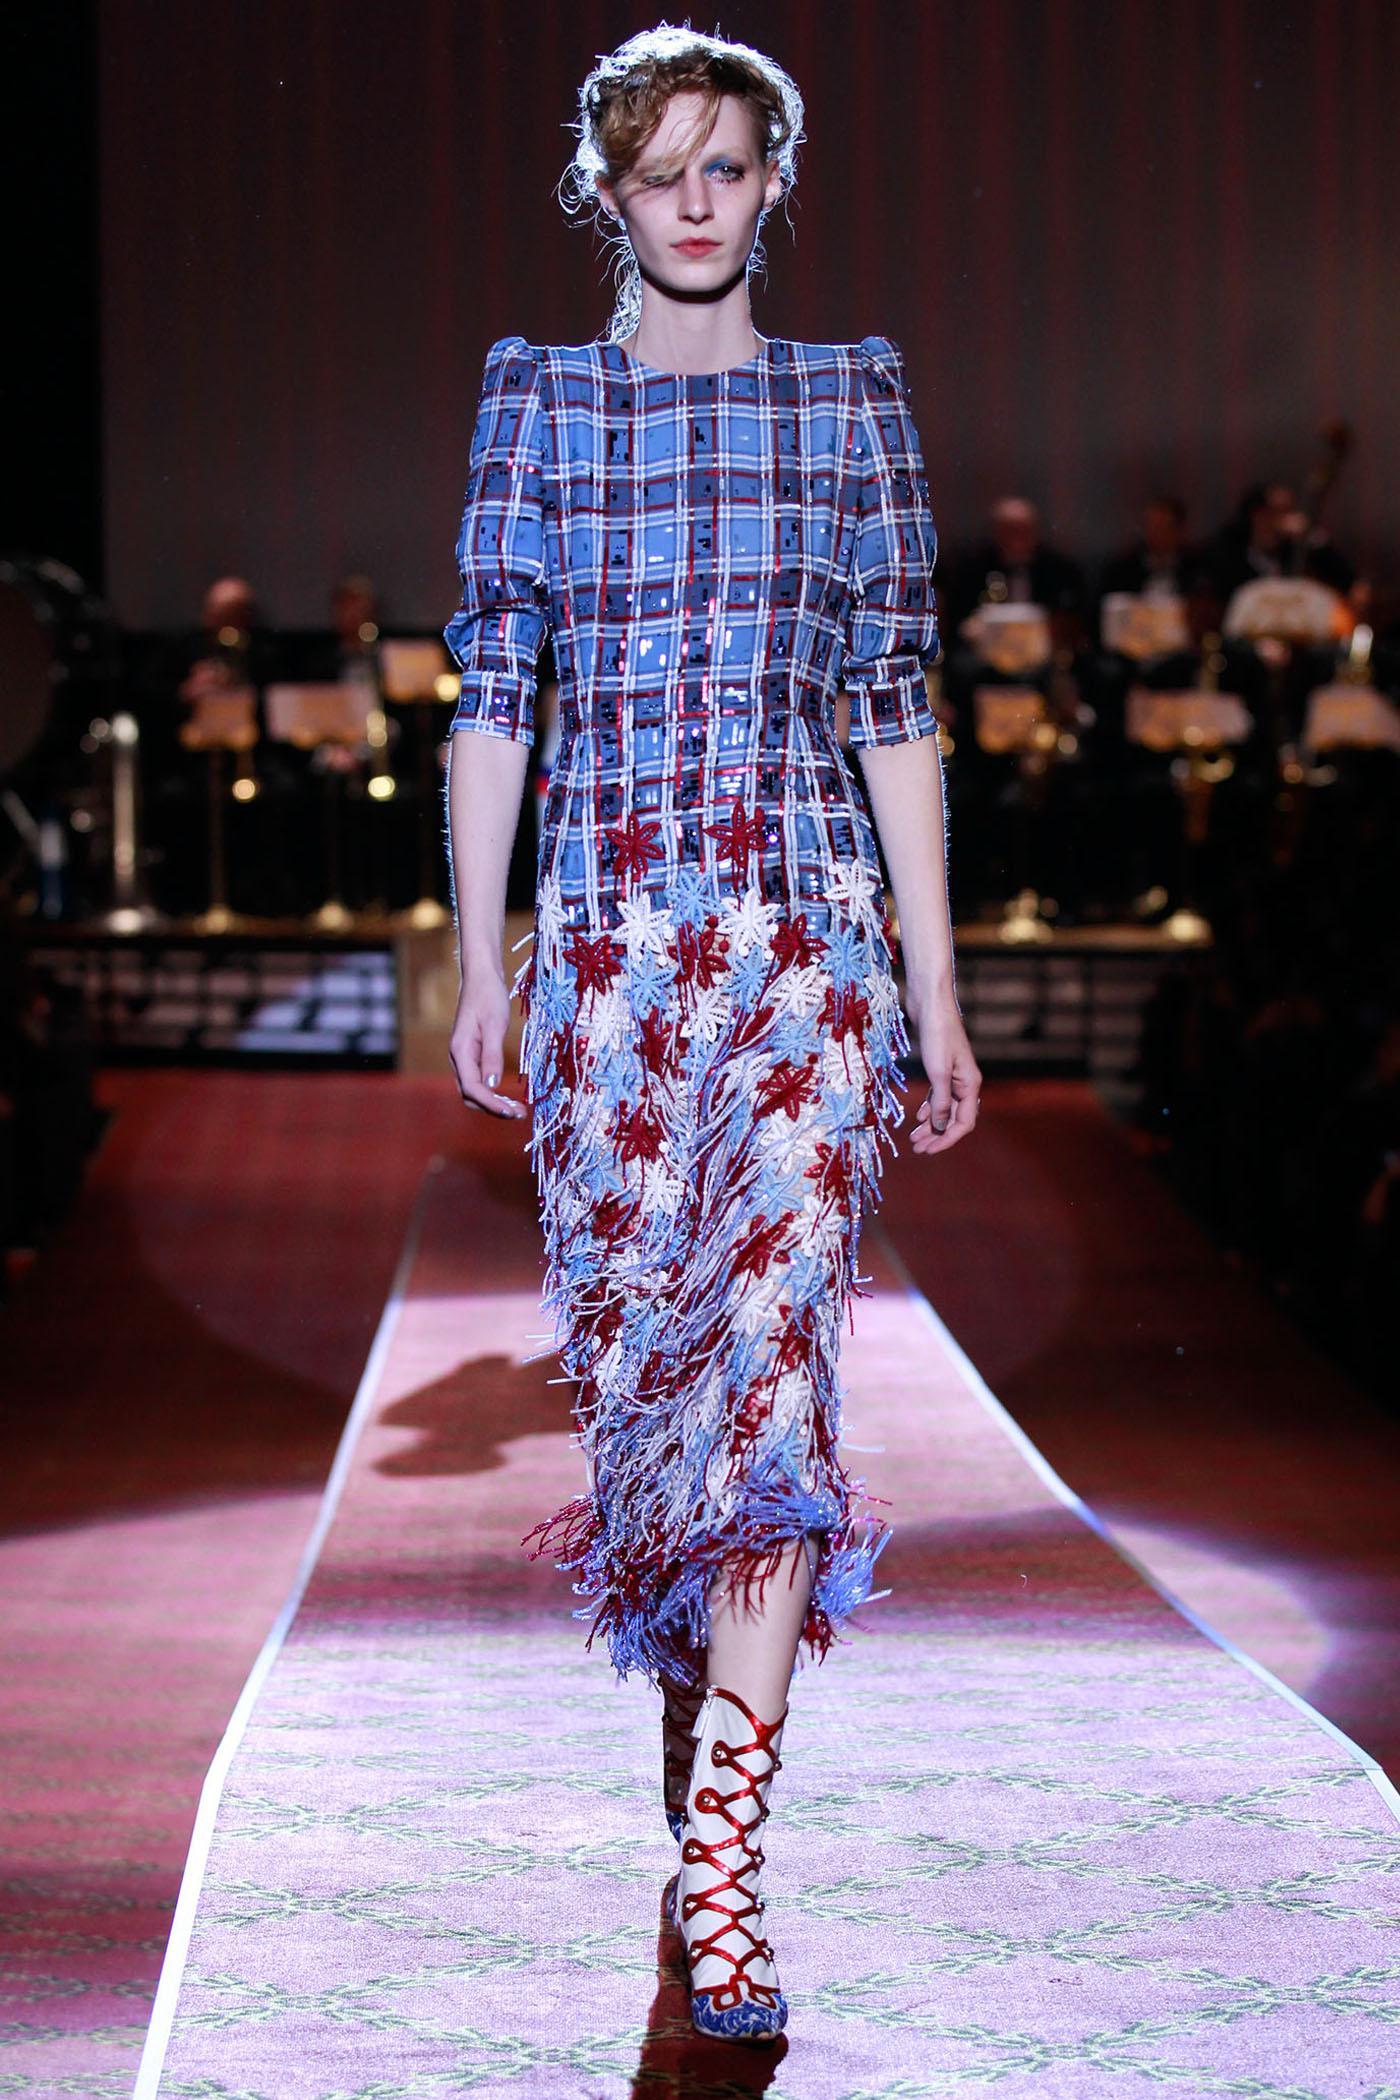 Watch Anna ewers marc jacobs fashion show fw 2014 new york mq runway candids video